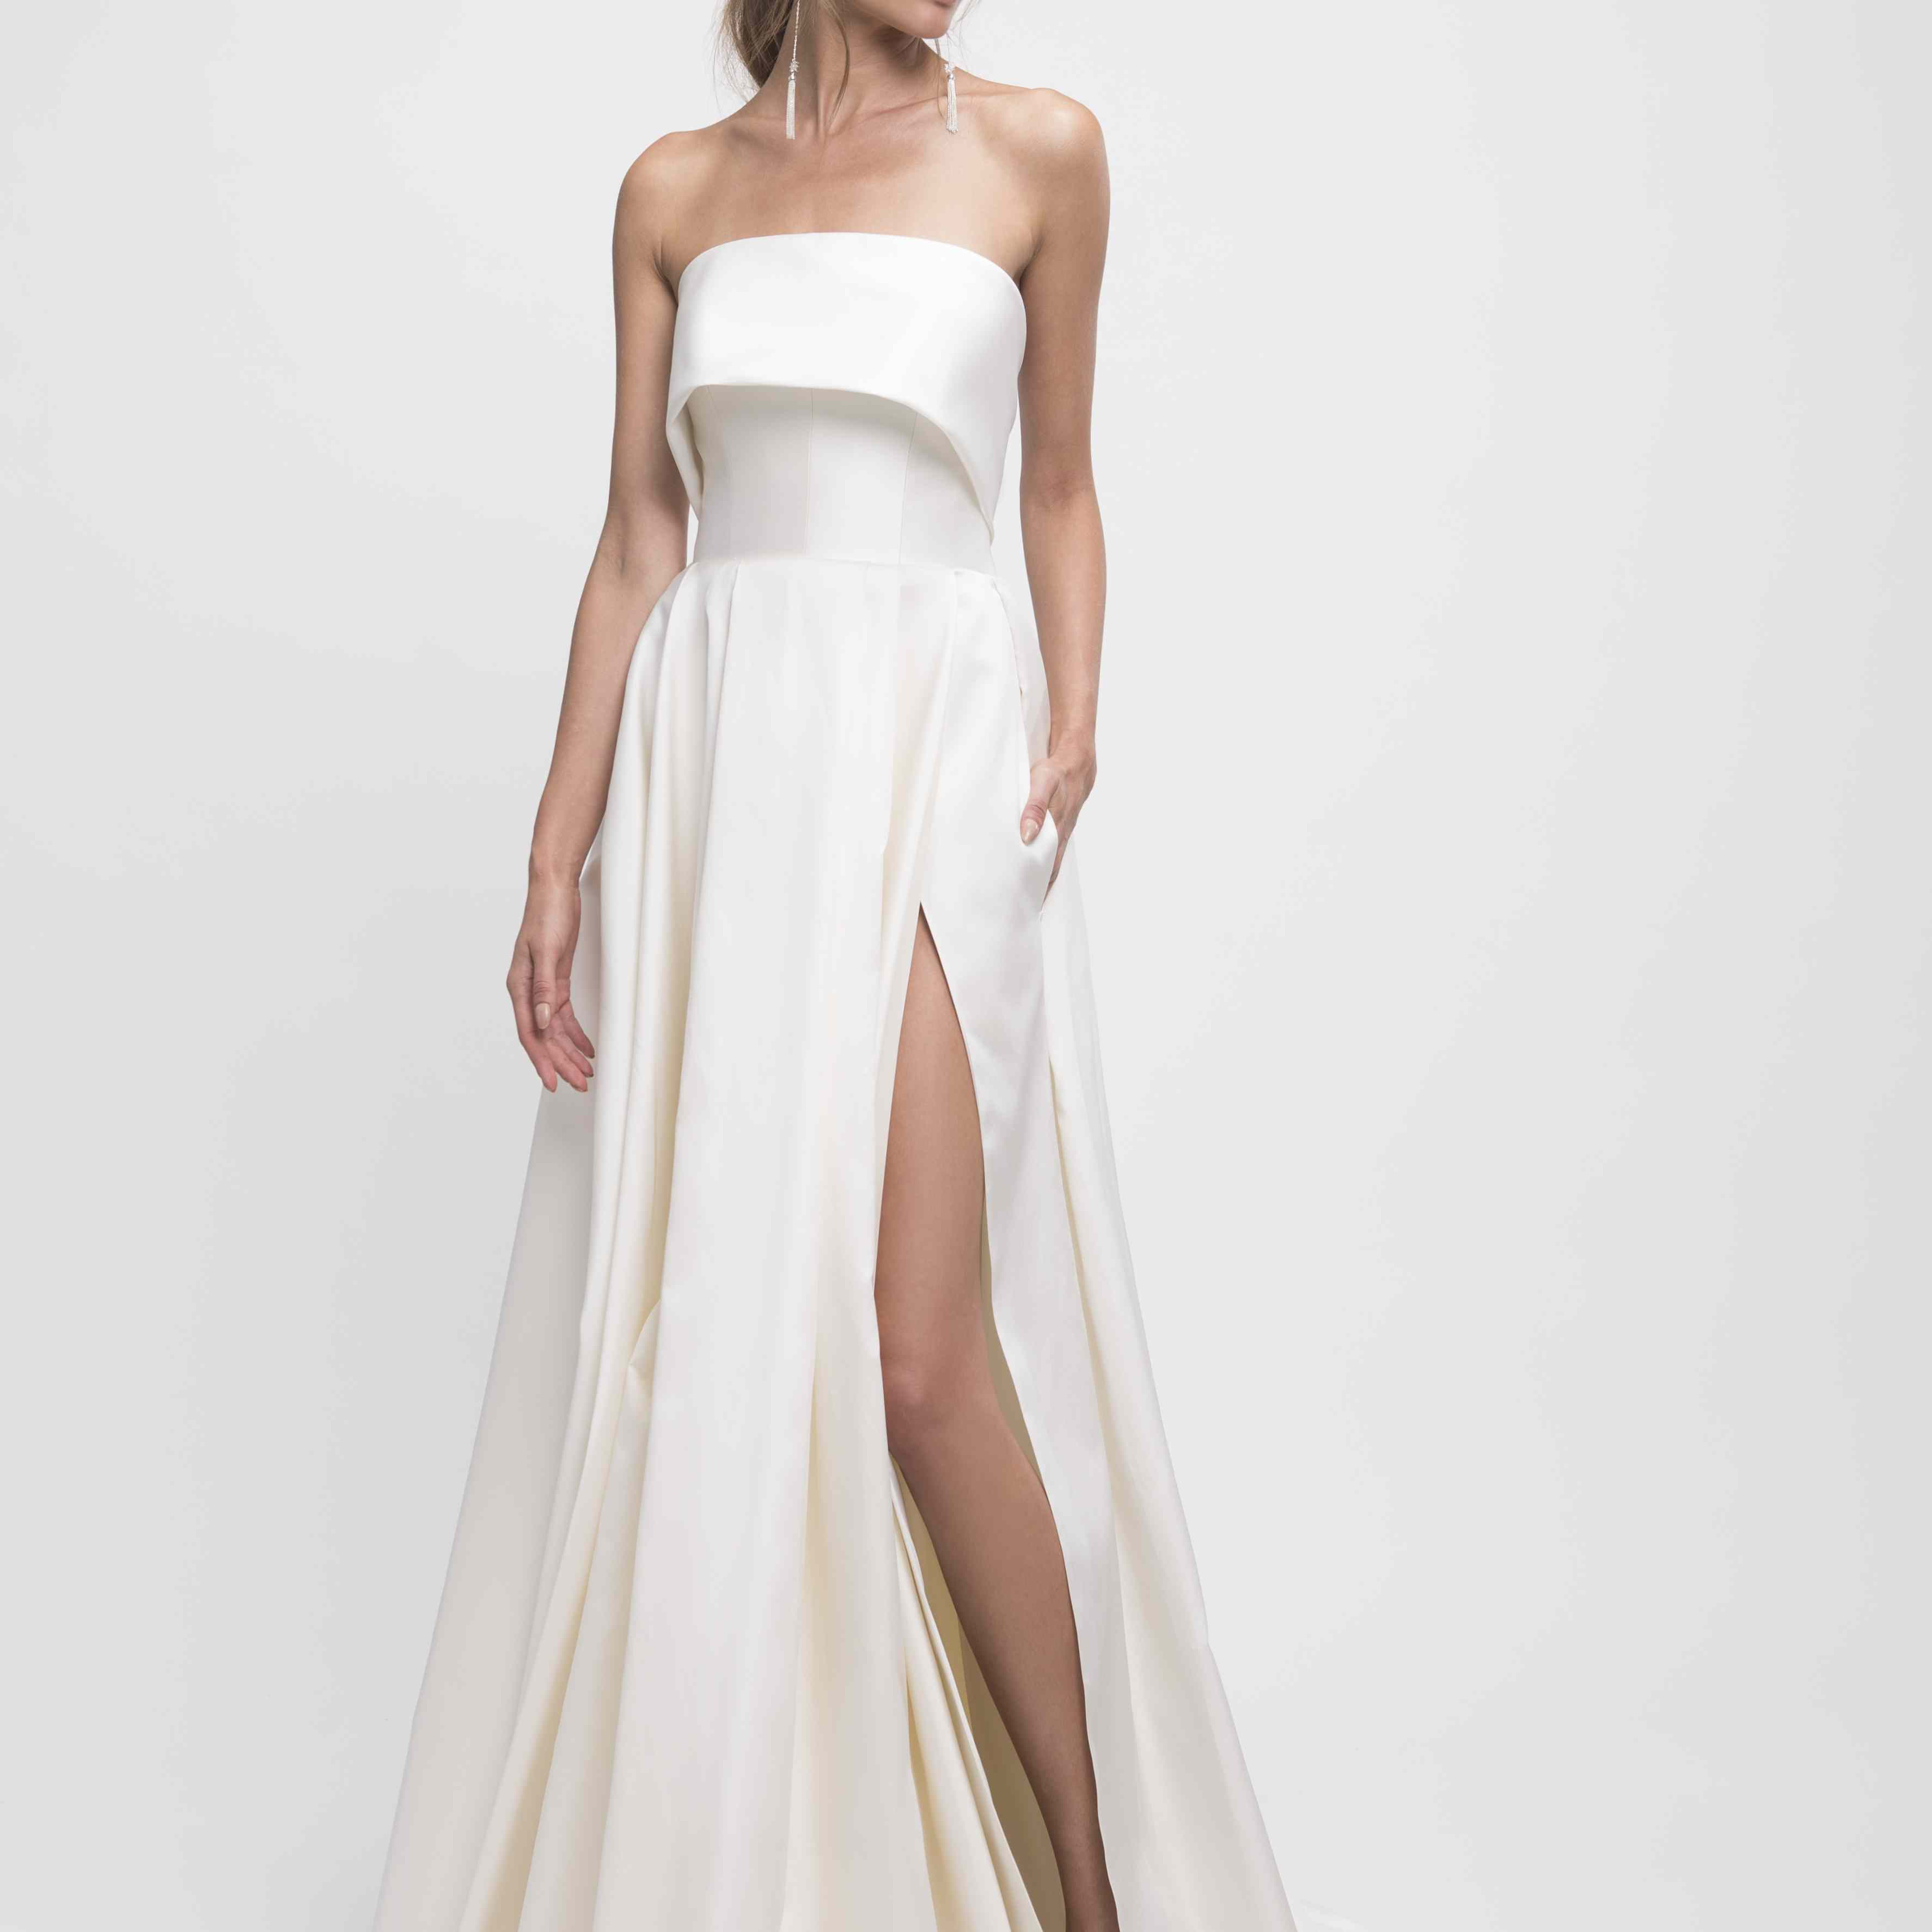 Ola wedding dress